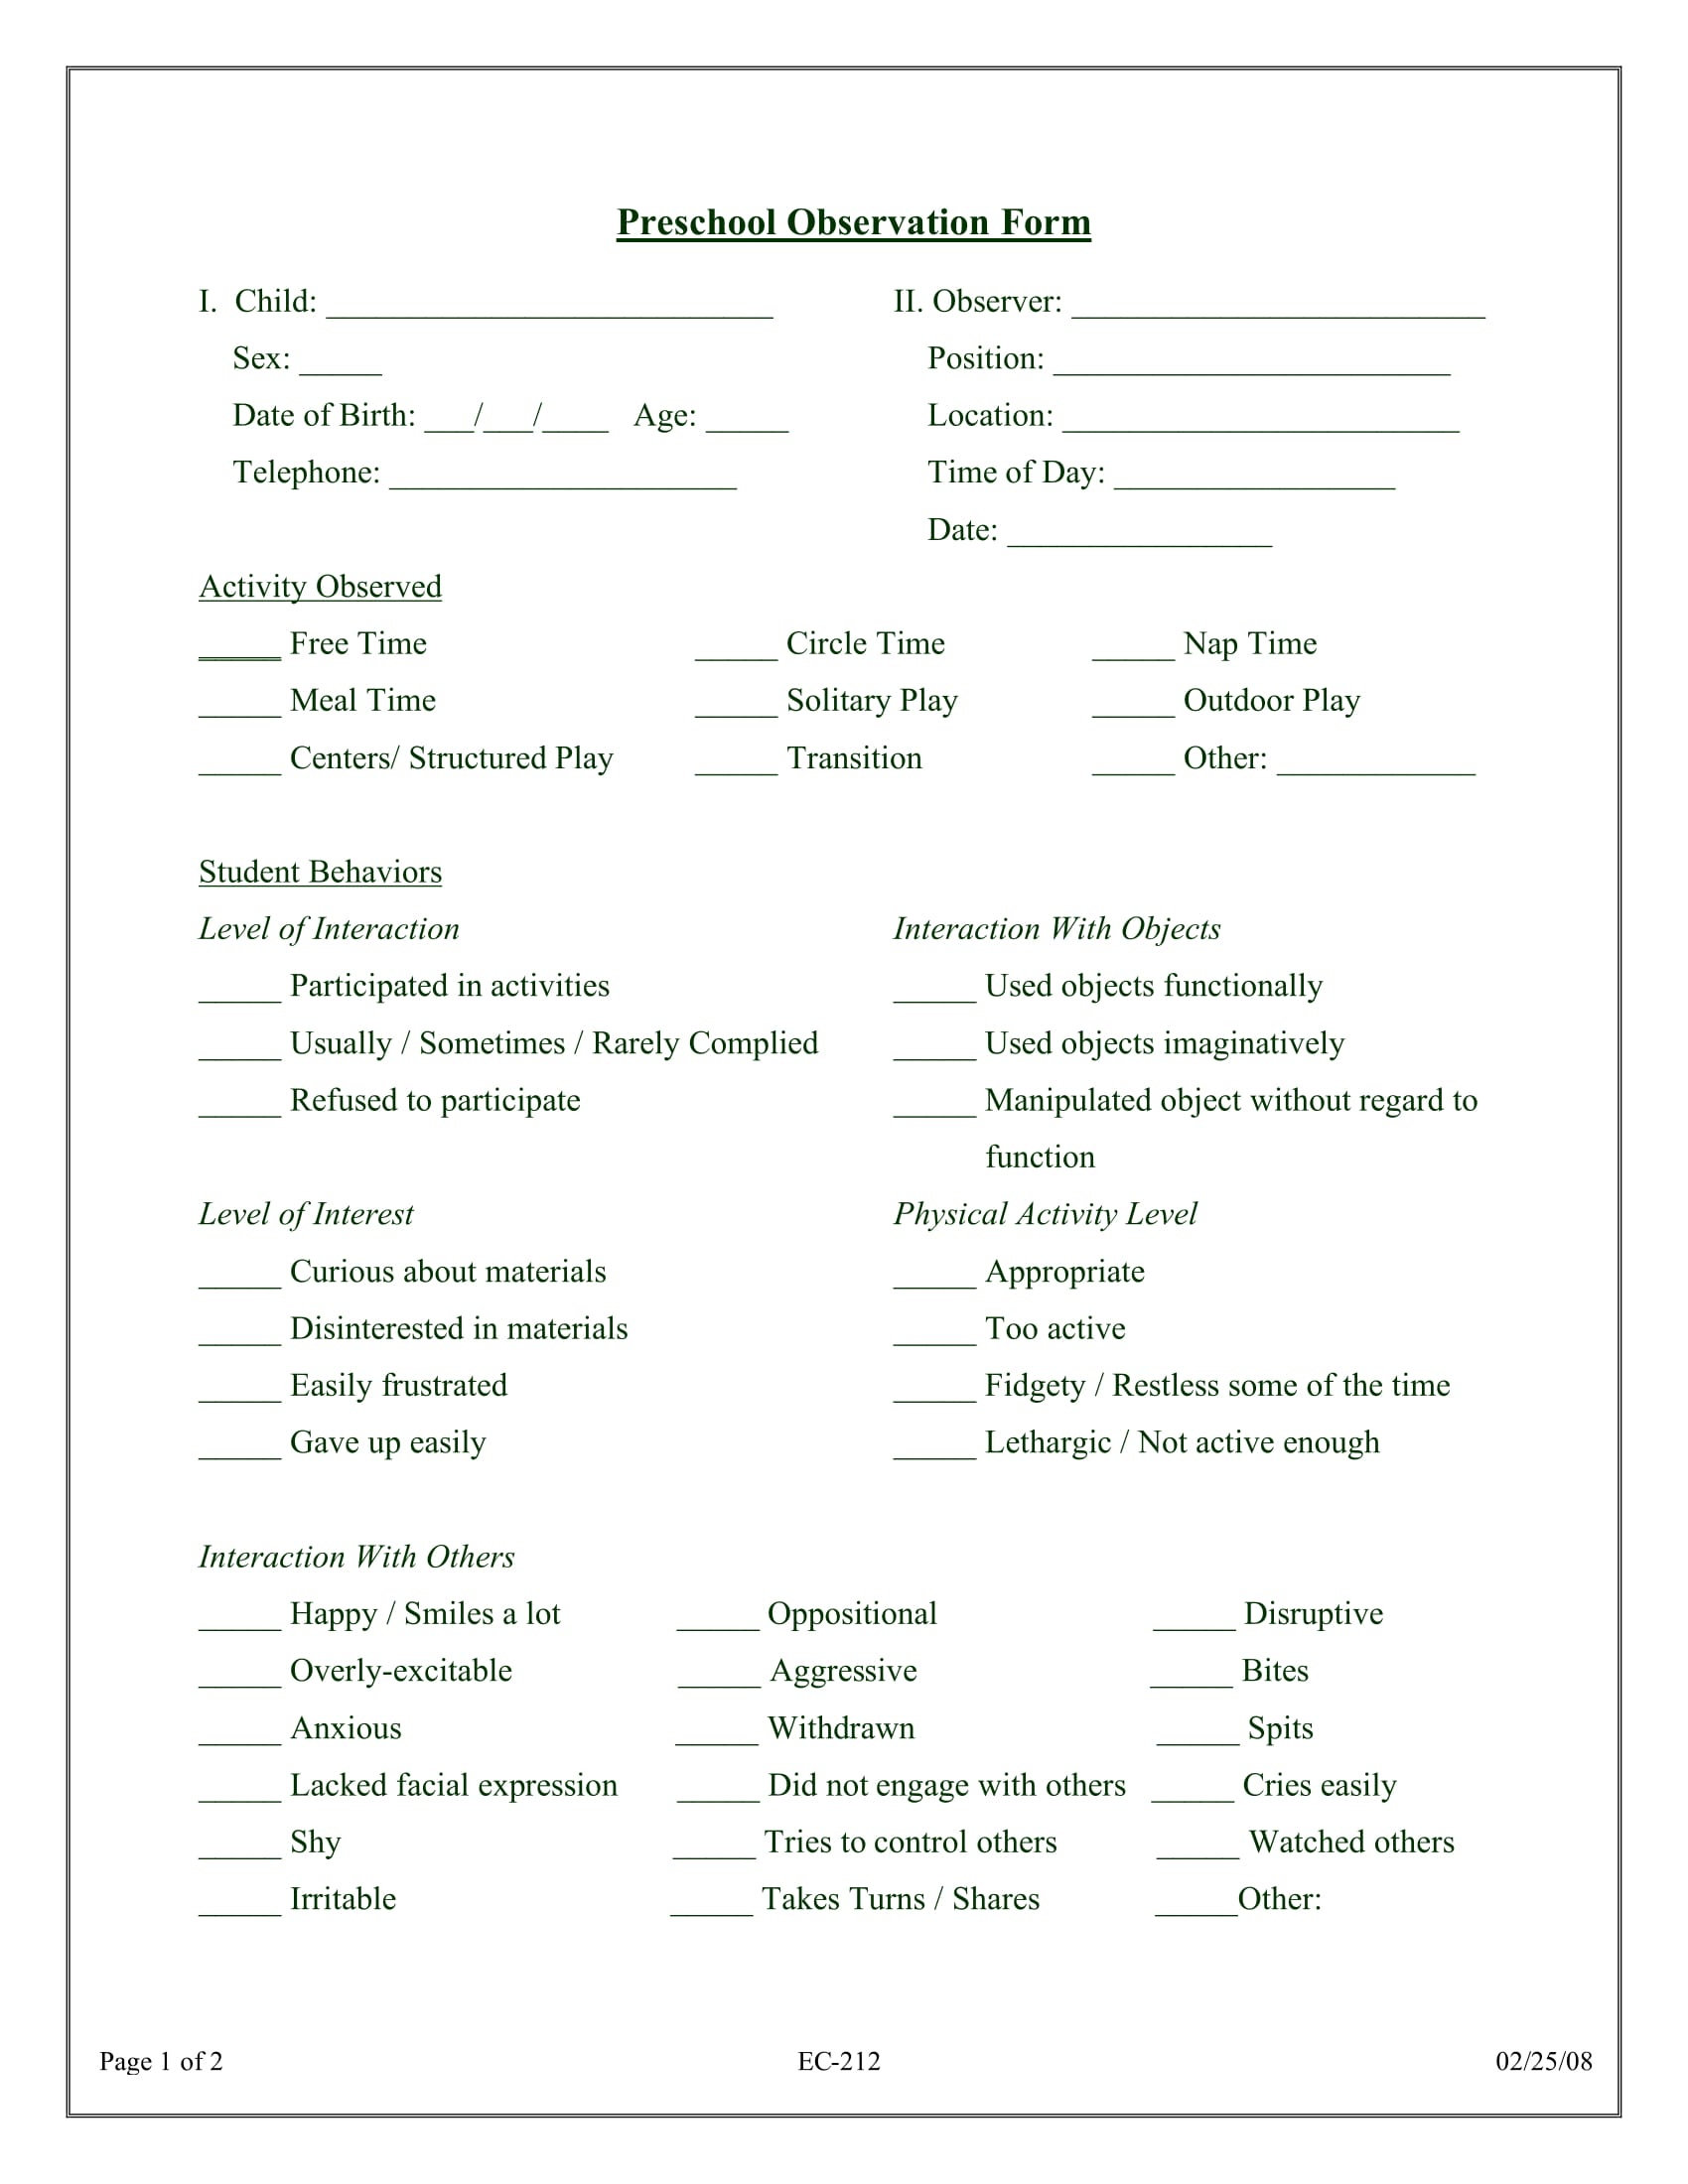 3 Preschool Observation Forms